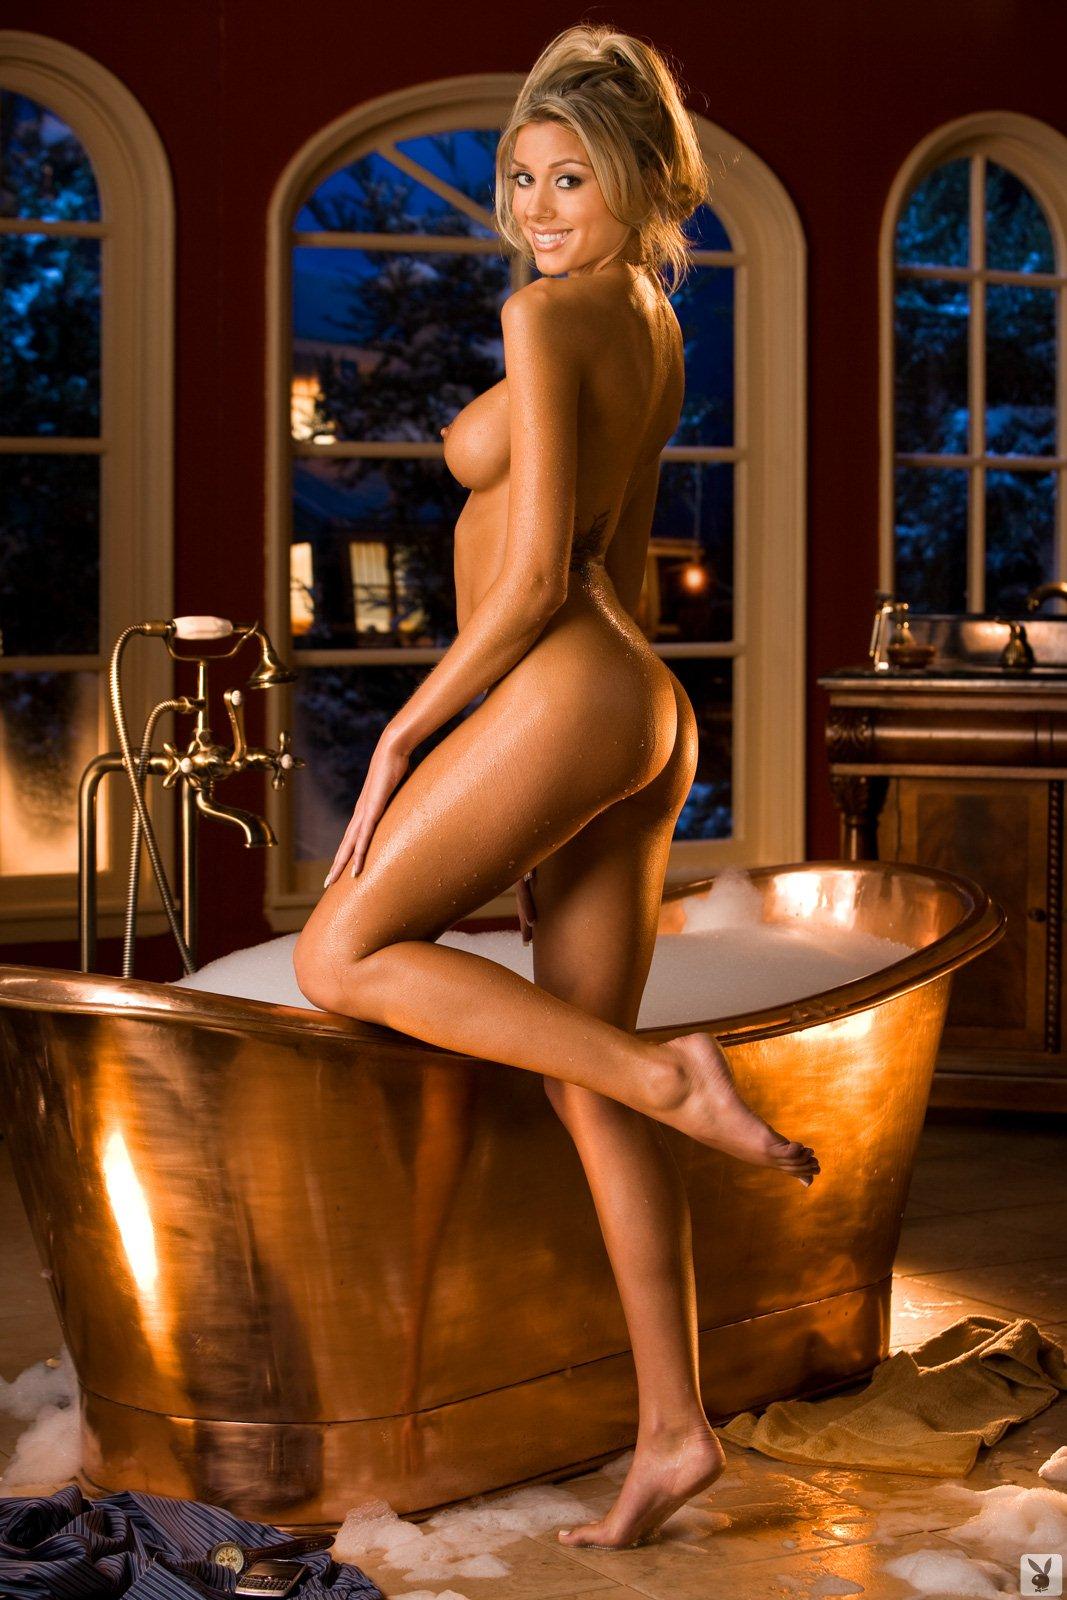 naked-girls-taking-bath-boobs-wet-mix-vol4-49